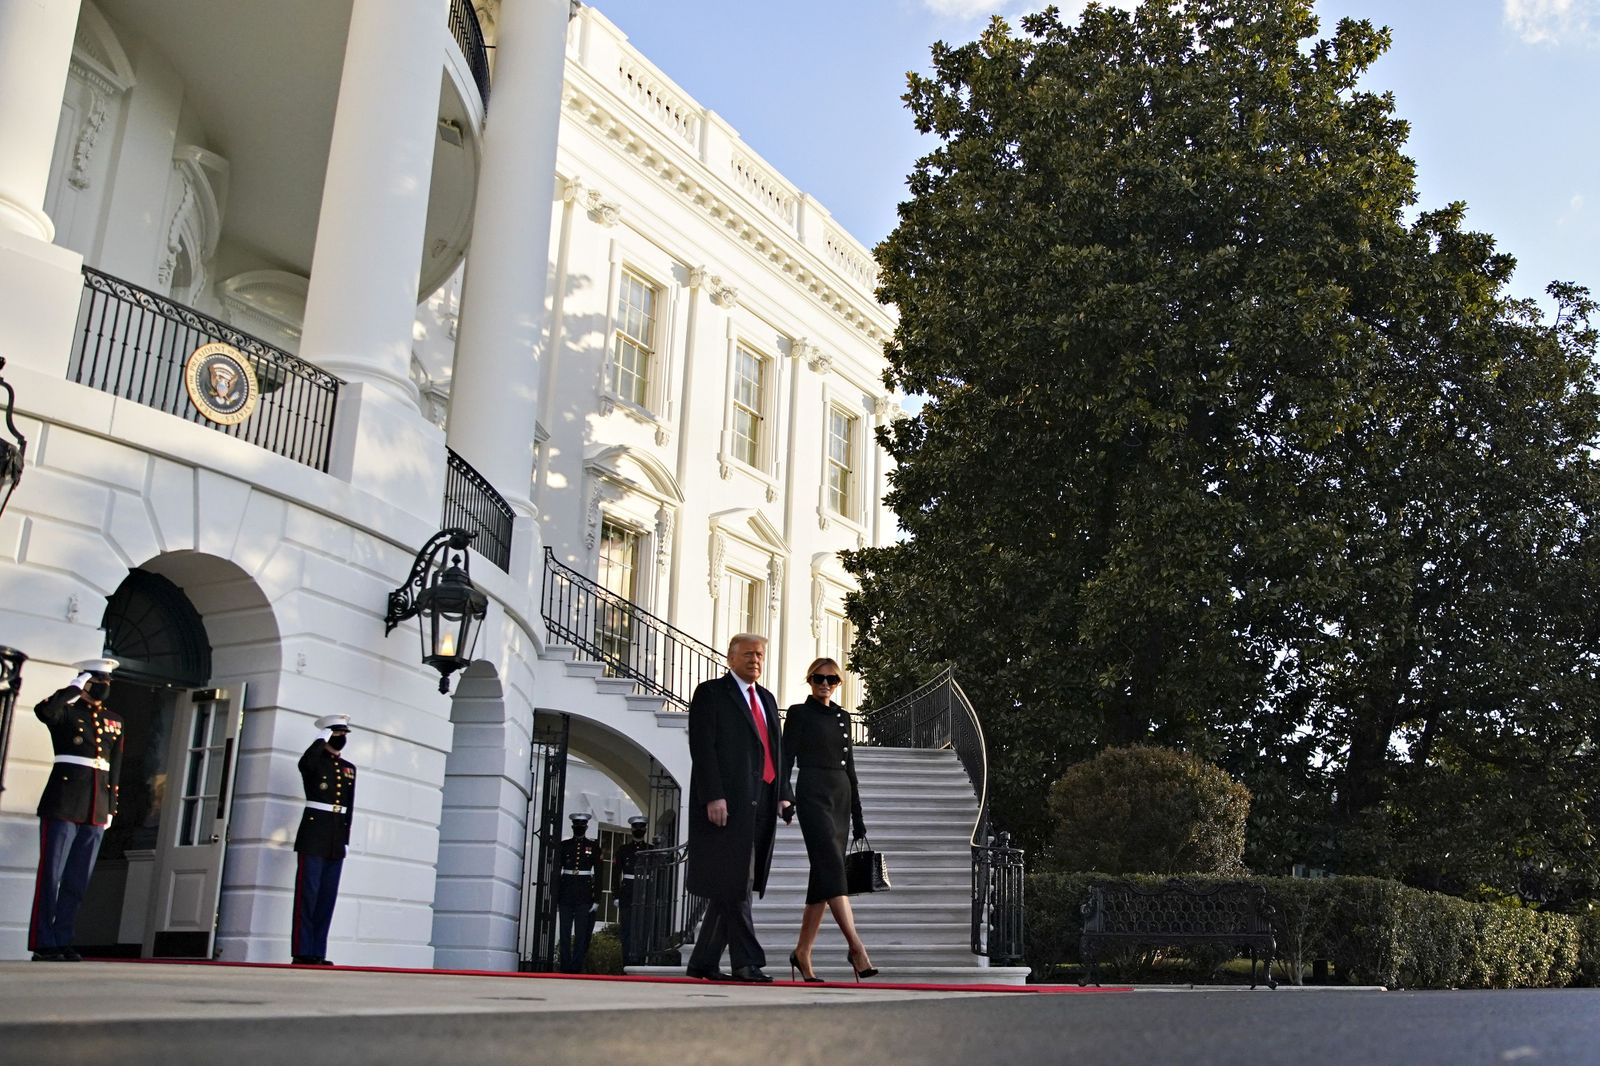 Trump leaves White House, Washington, USA - 20 Jan 2021